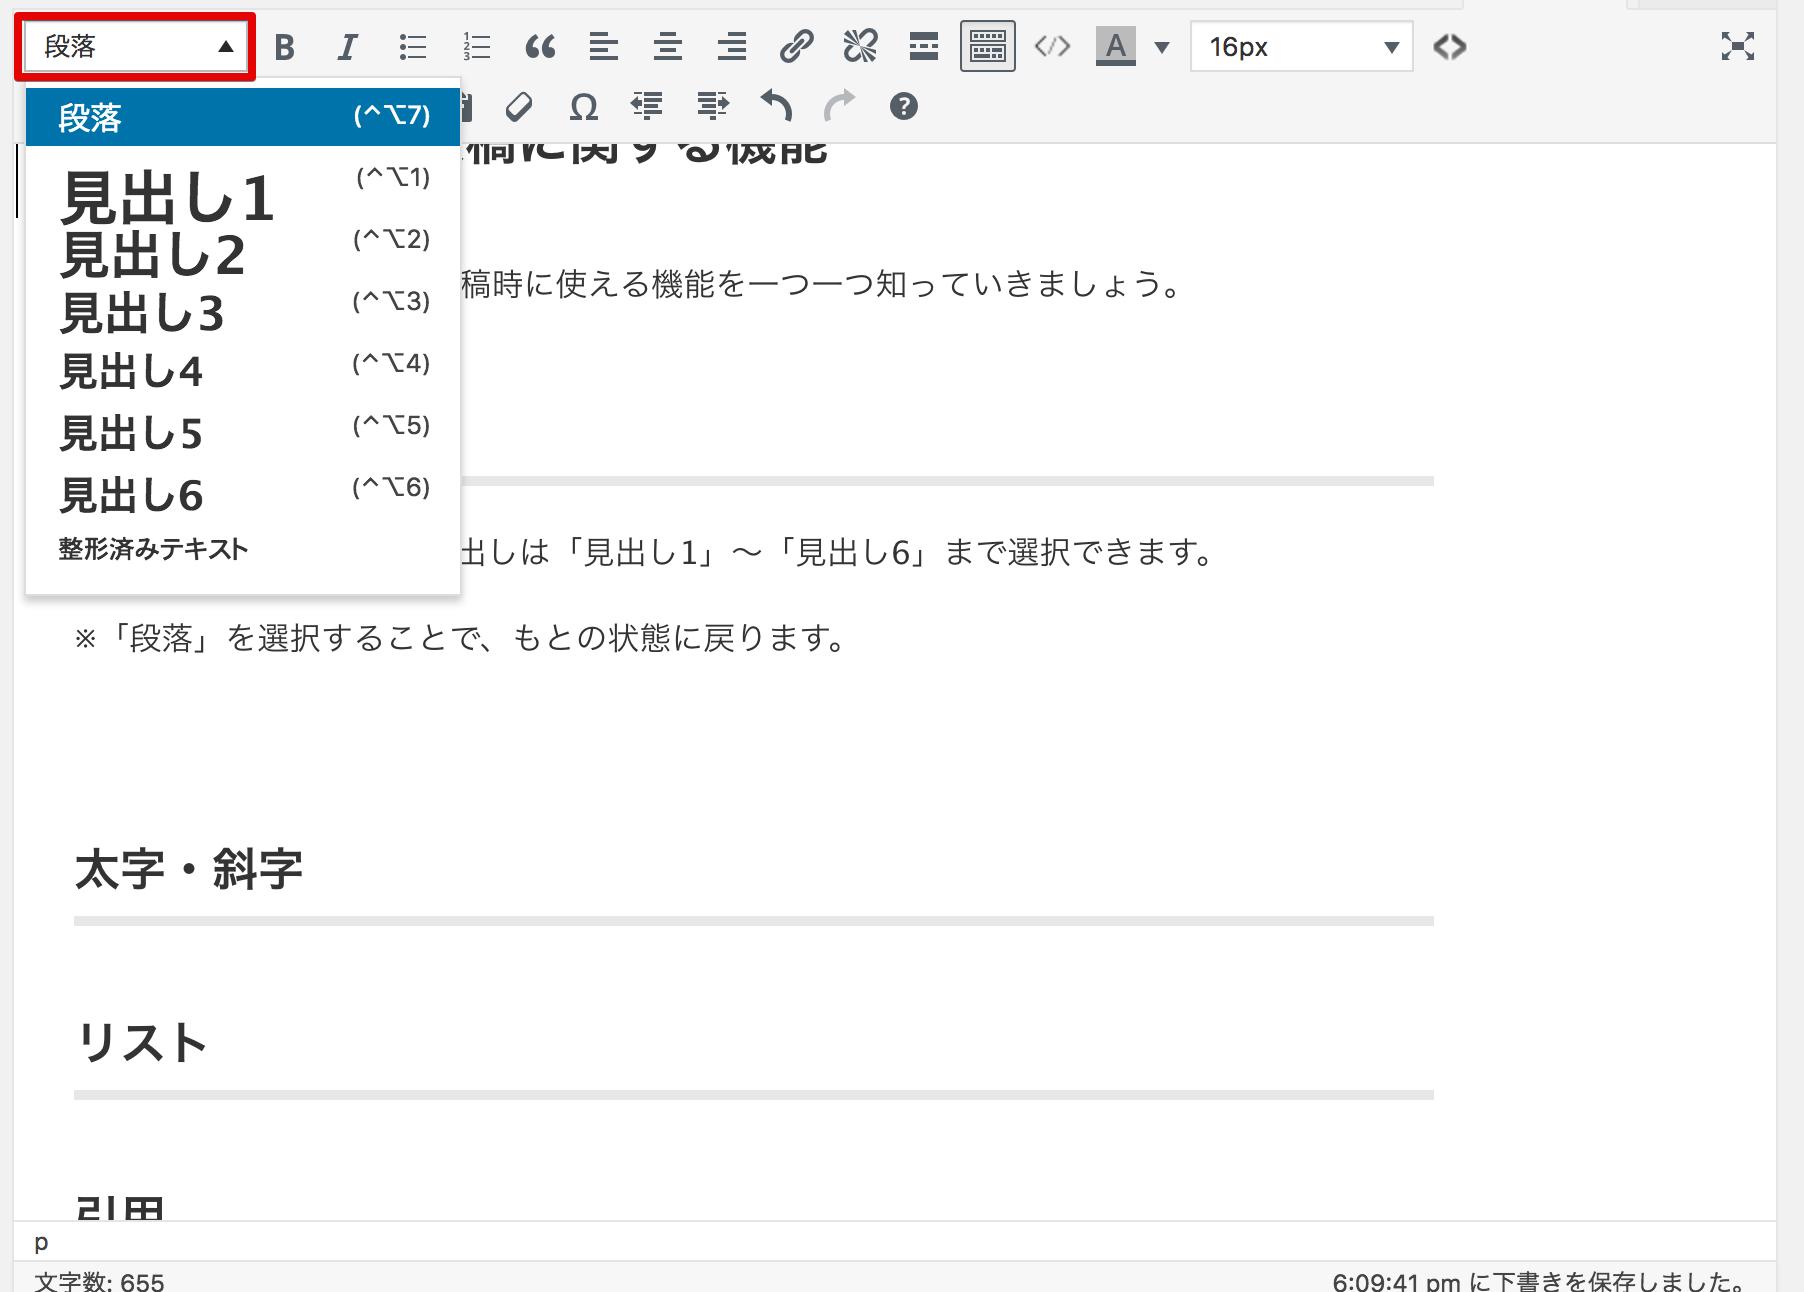 c6fbeca21bb4ae9bbc965deaaebddb0d - 初心者向け!WordPressの投稿方法や記事の編集方法を徹底解説